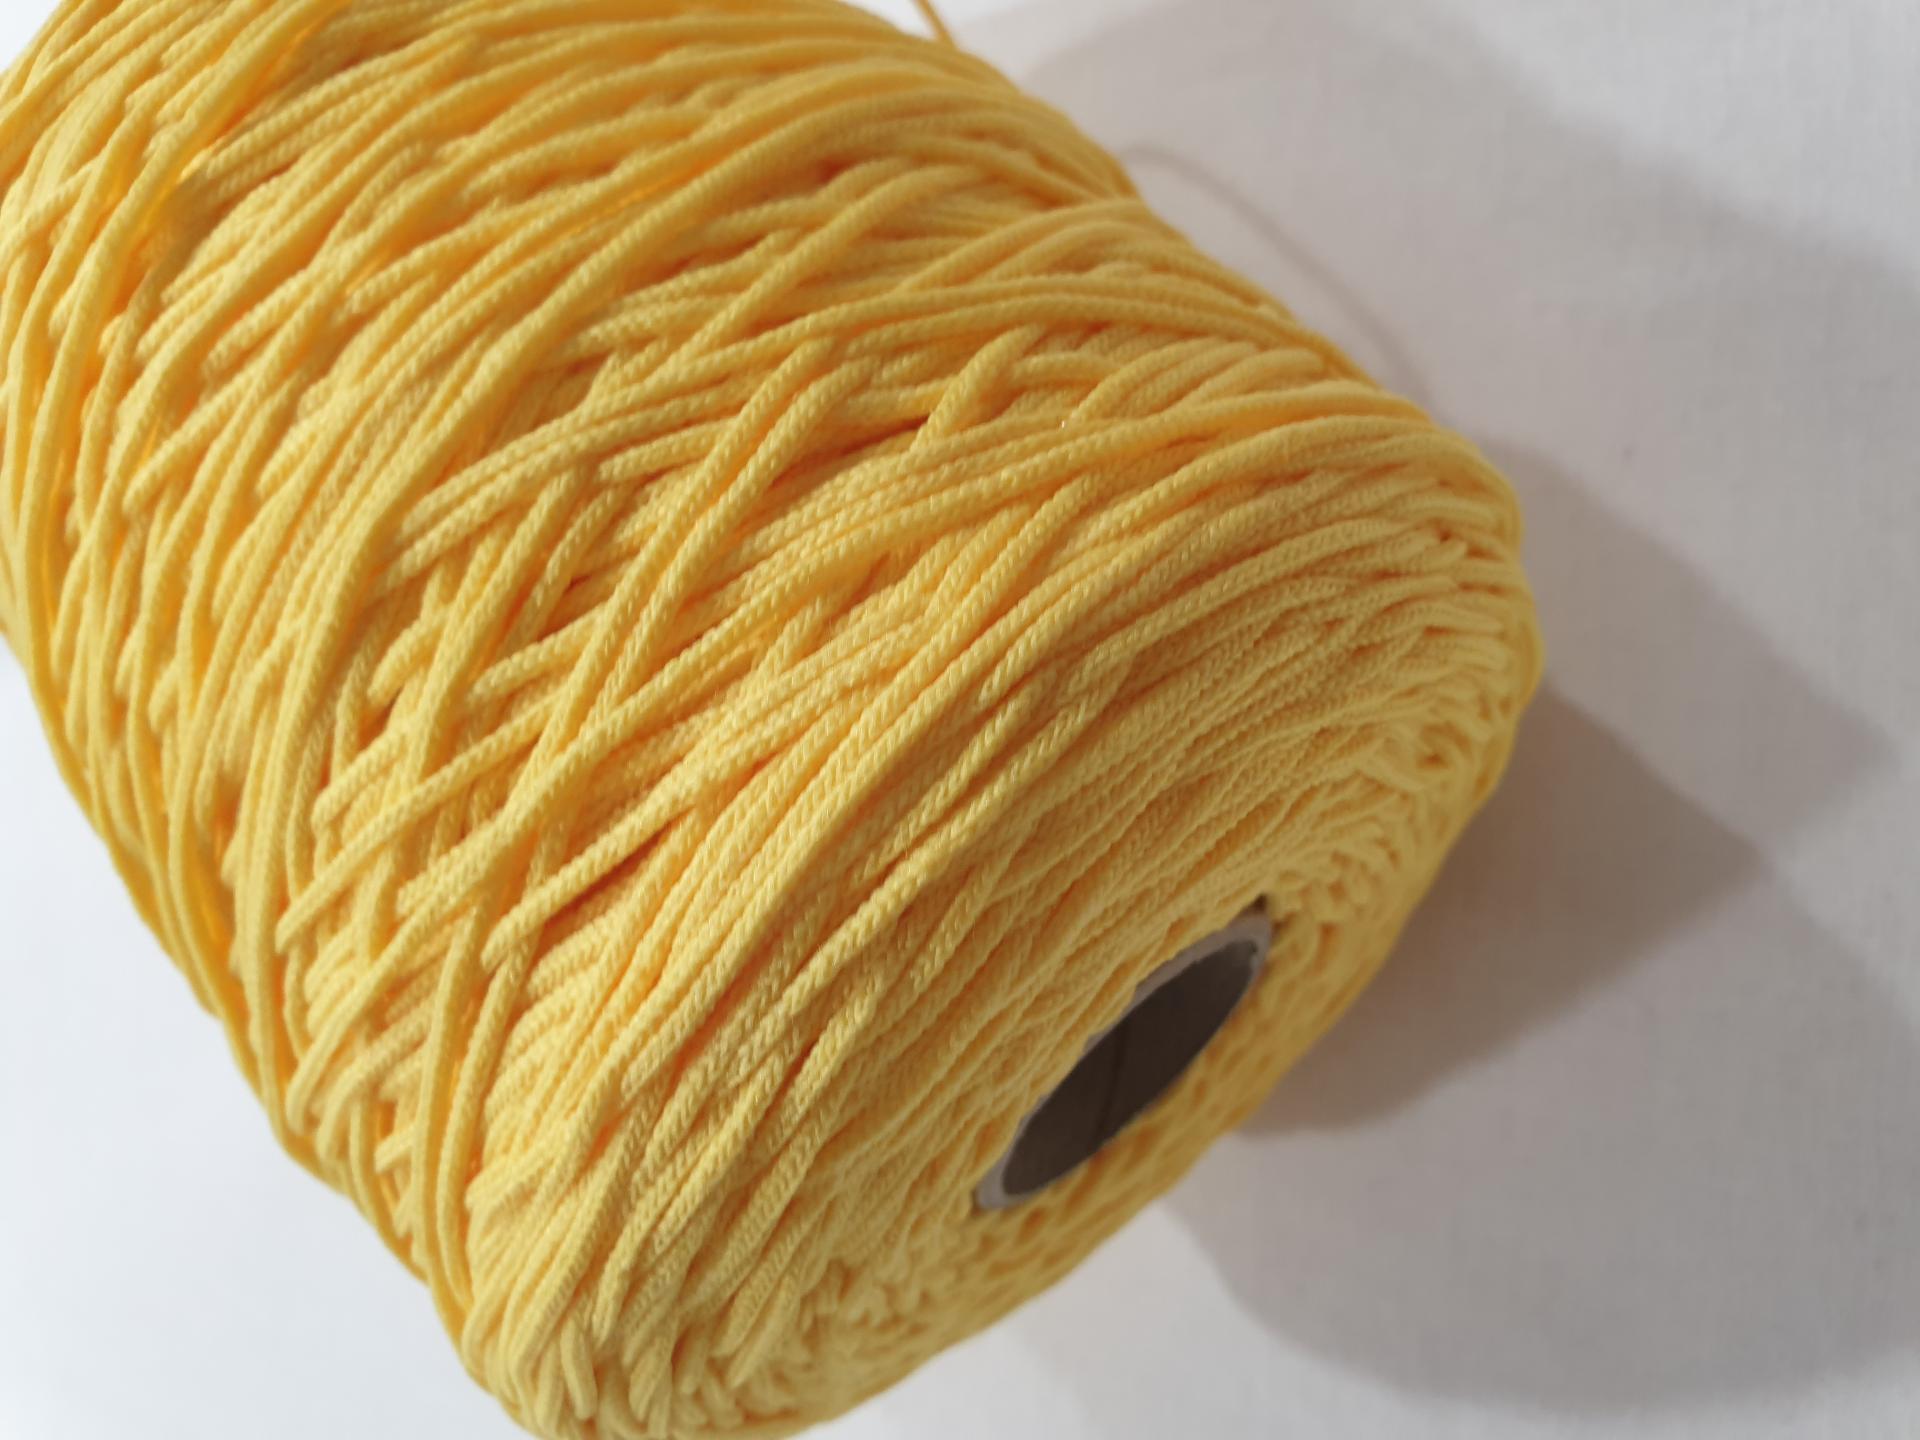 Goma Redonda Suave - Amarilla